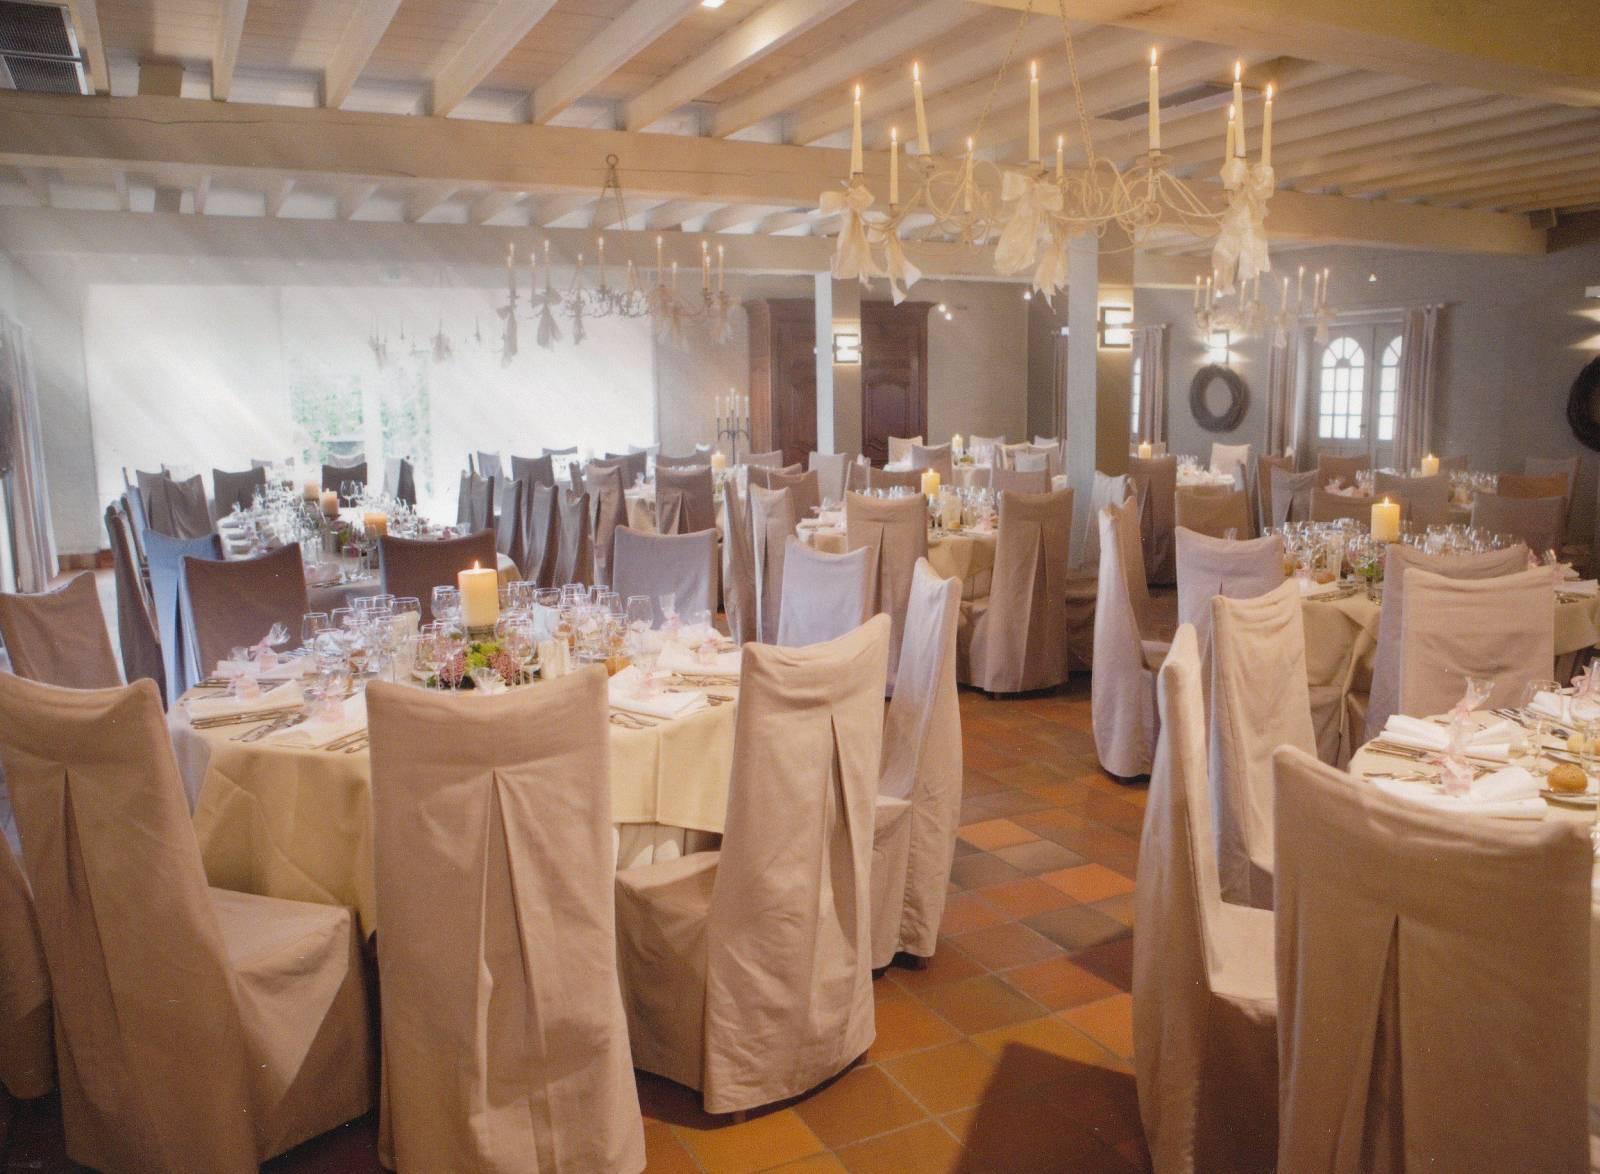 Geuzenhof - Feestzaal - House of Weddings - 5 (1)